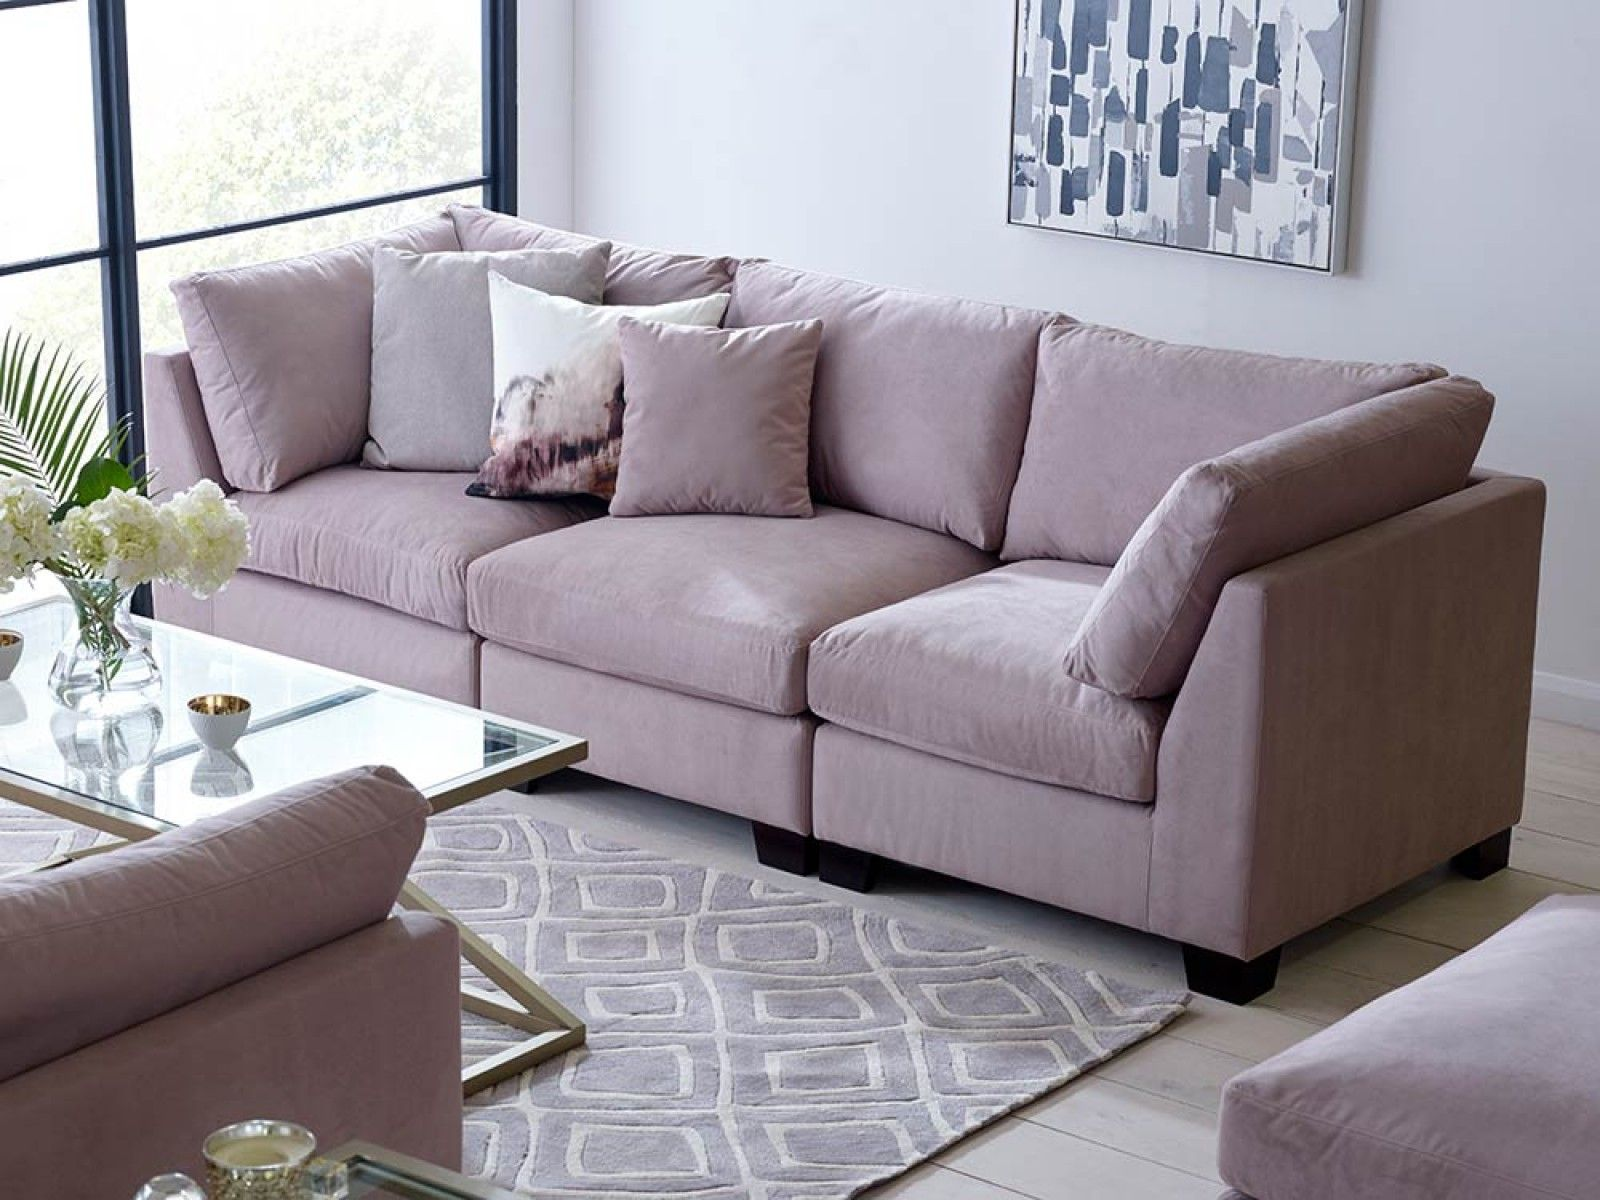 Isabelle Sofa Sectional Set Sofa, Sectional sofa